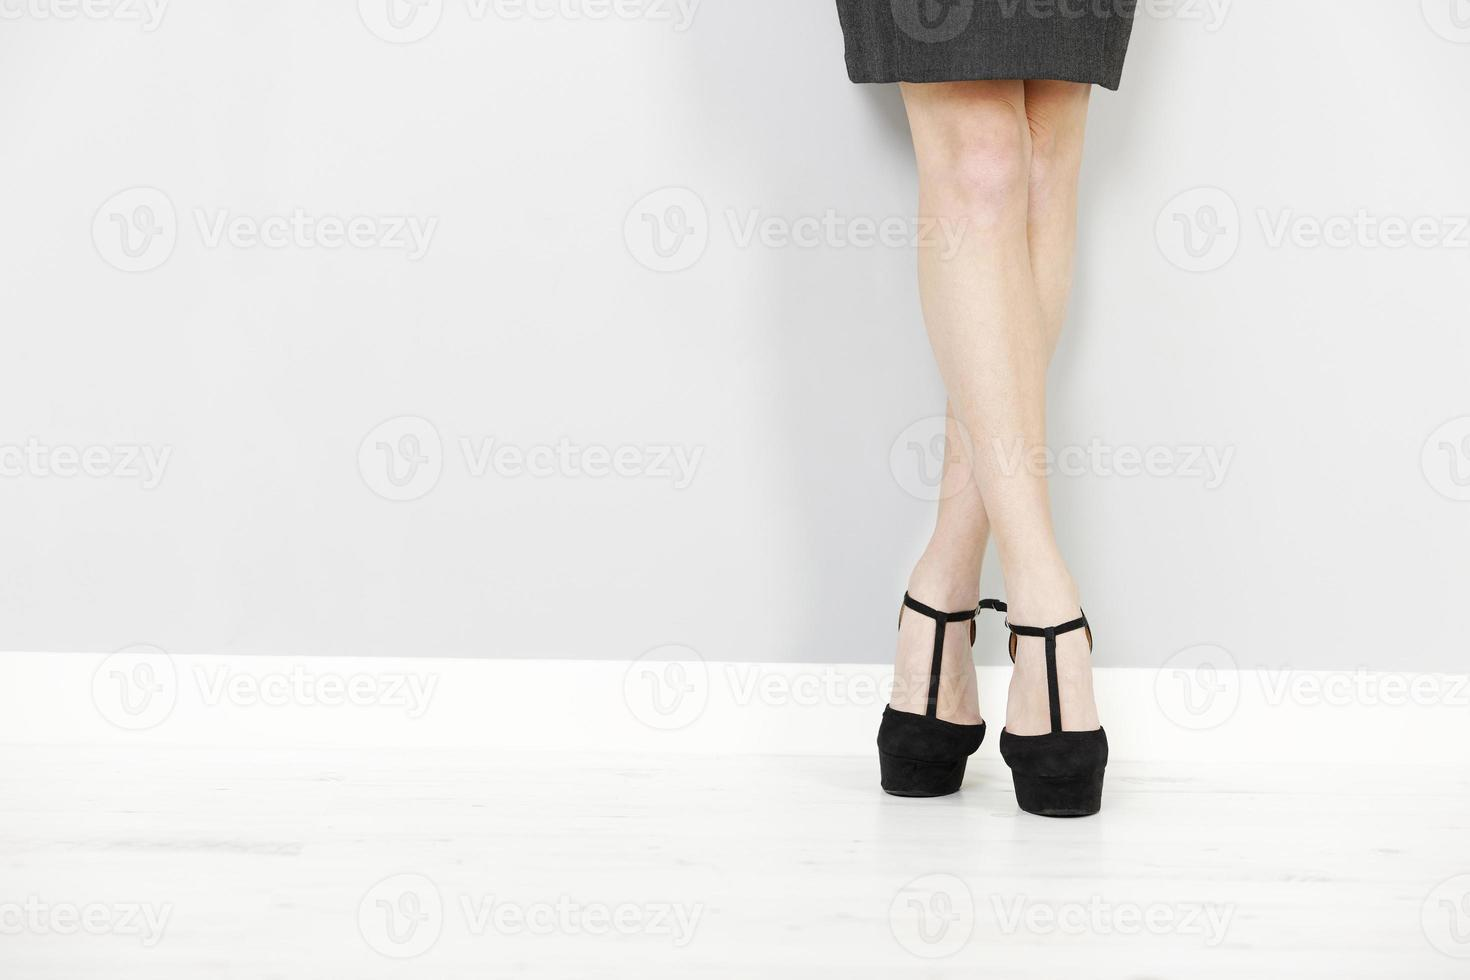 jambes de femme contre un mur photo